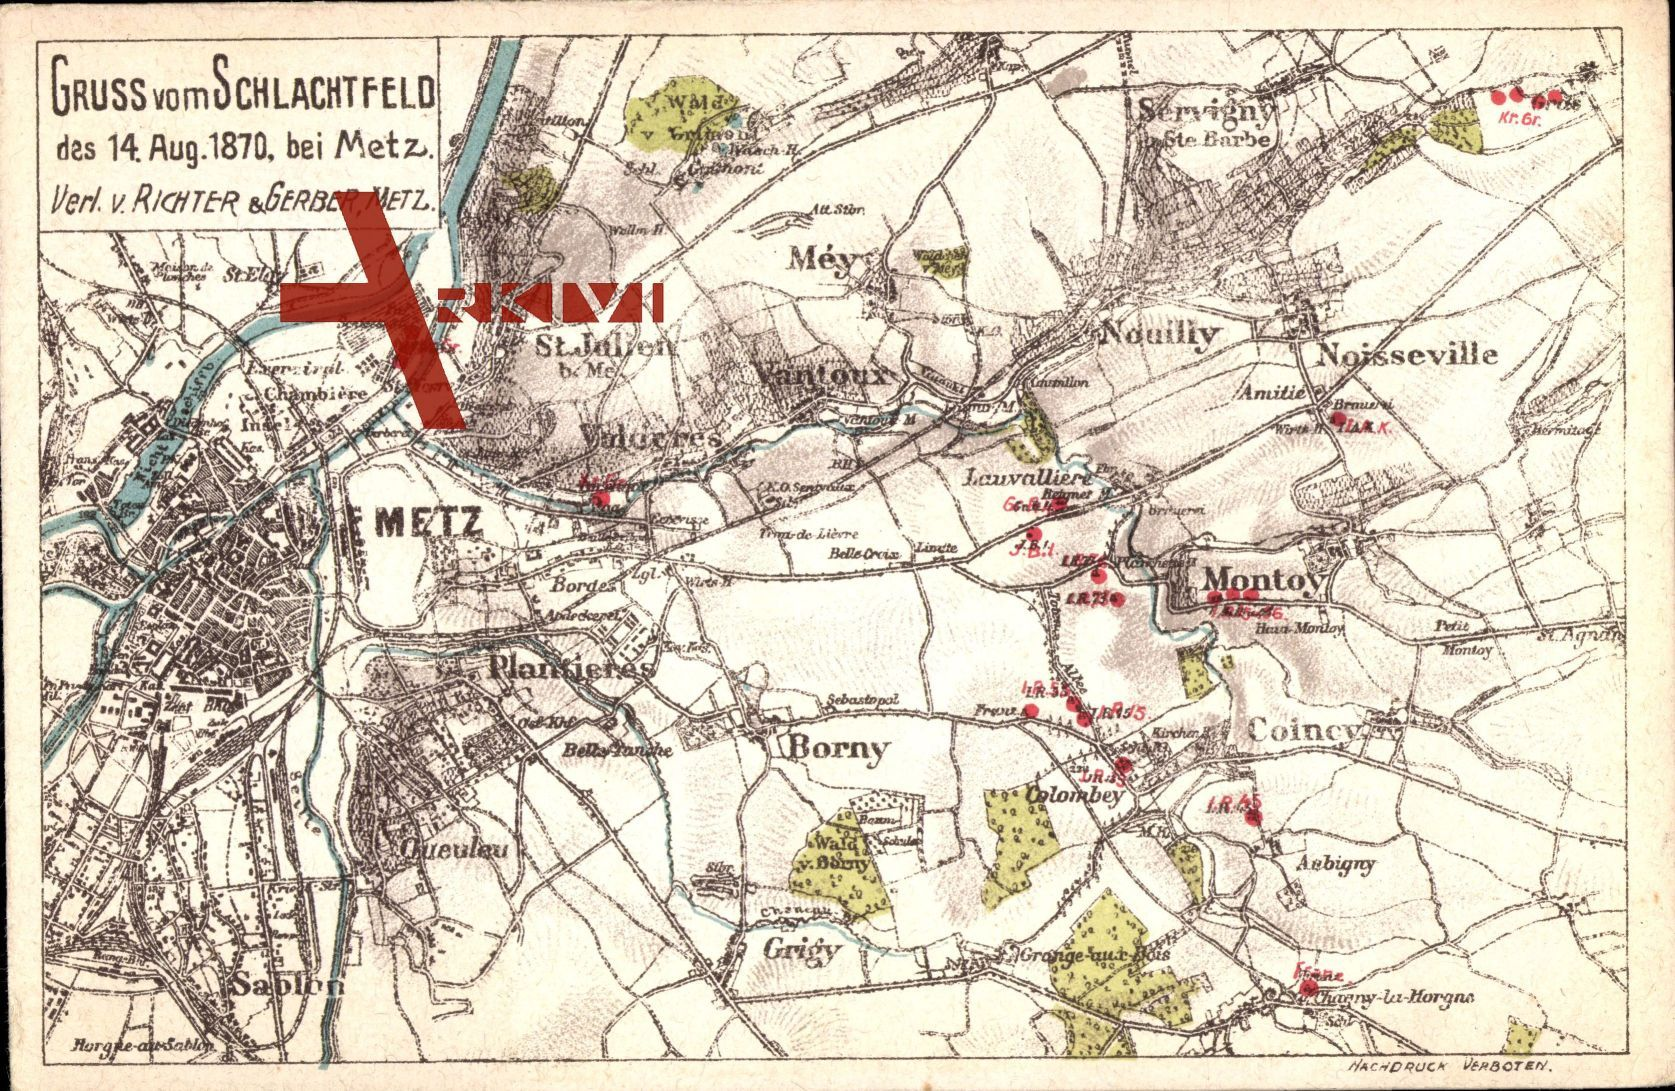 Landkarten Metz Moselle, Schlachtfeld des 14. Aug. 1870, Montoy, Colombey